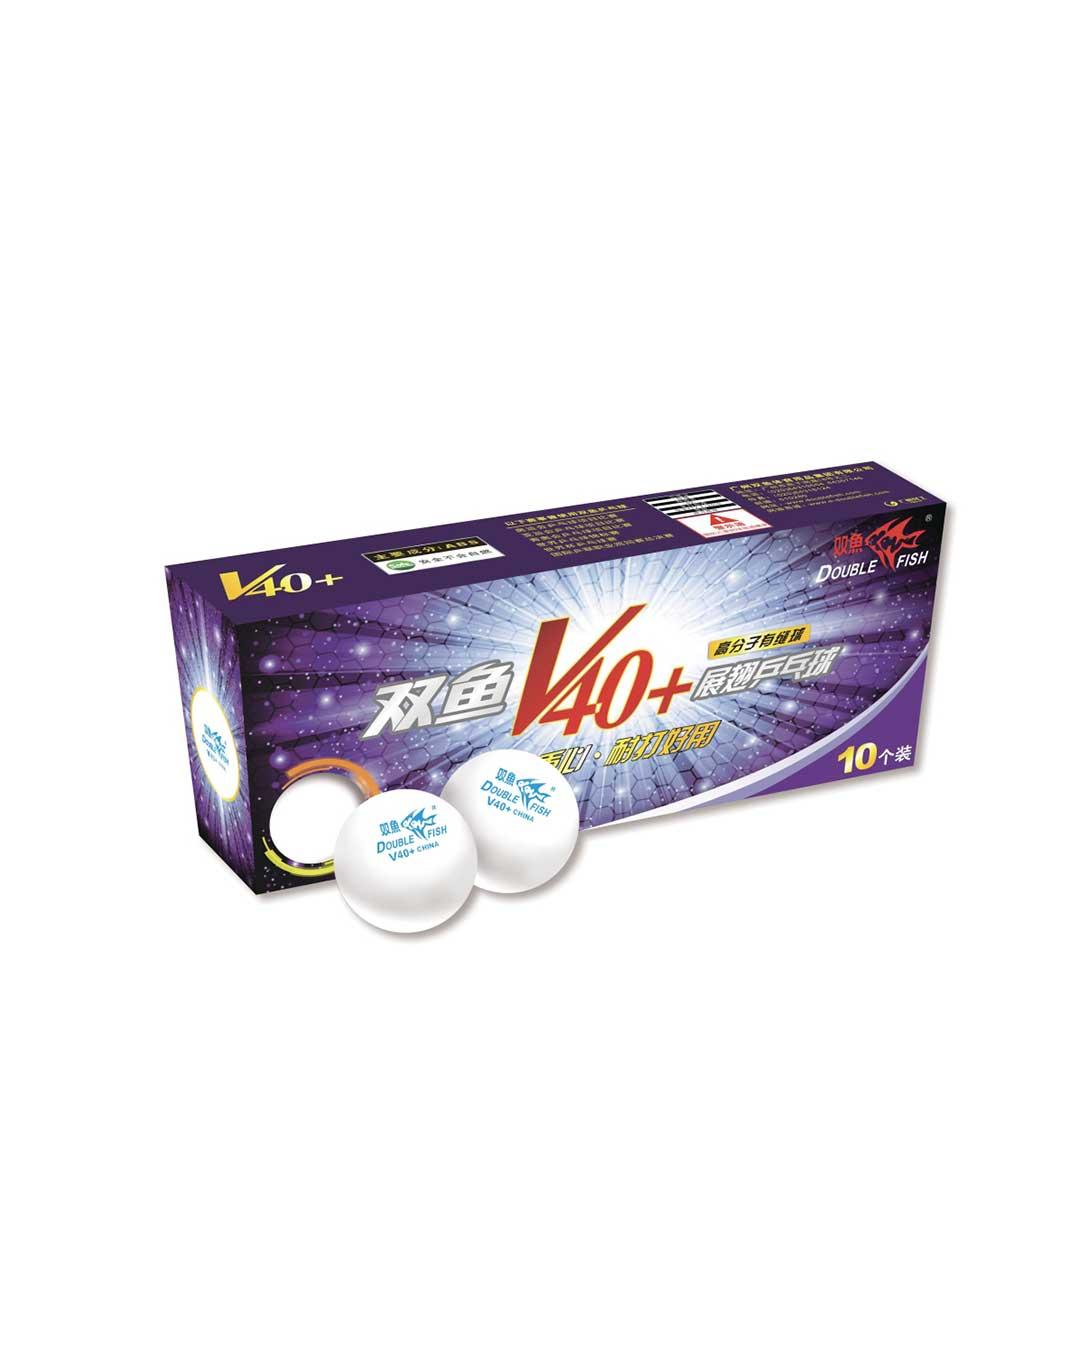 Pelotas de ping pong (Tenis de Mesa) marca Double Fish 40+ material ABS (incluye 10 pelotas blancas)